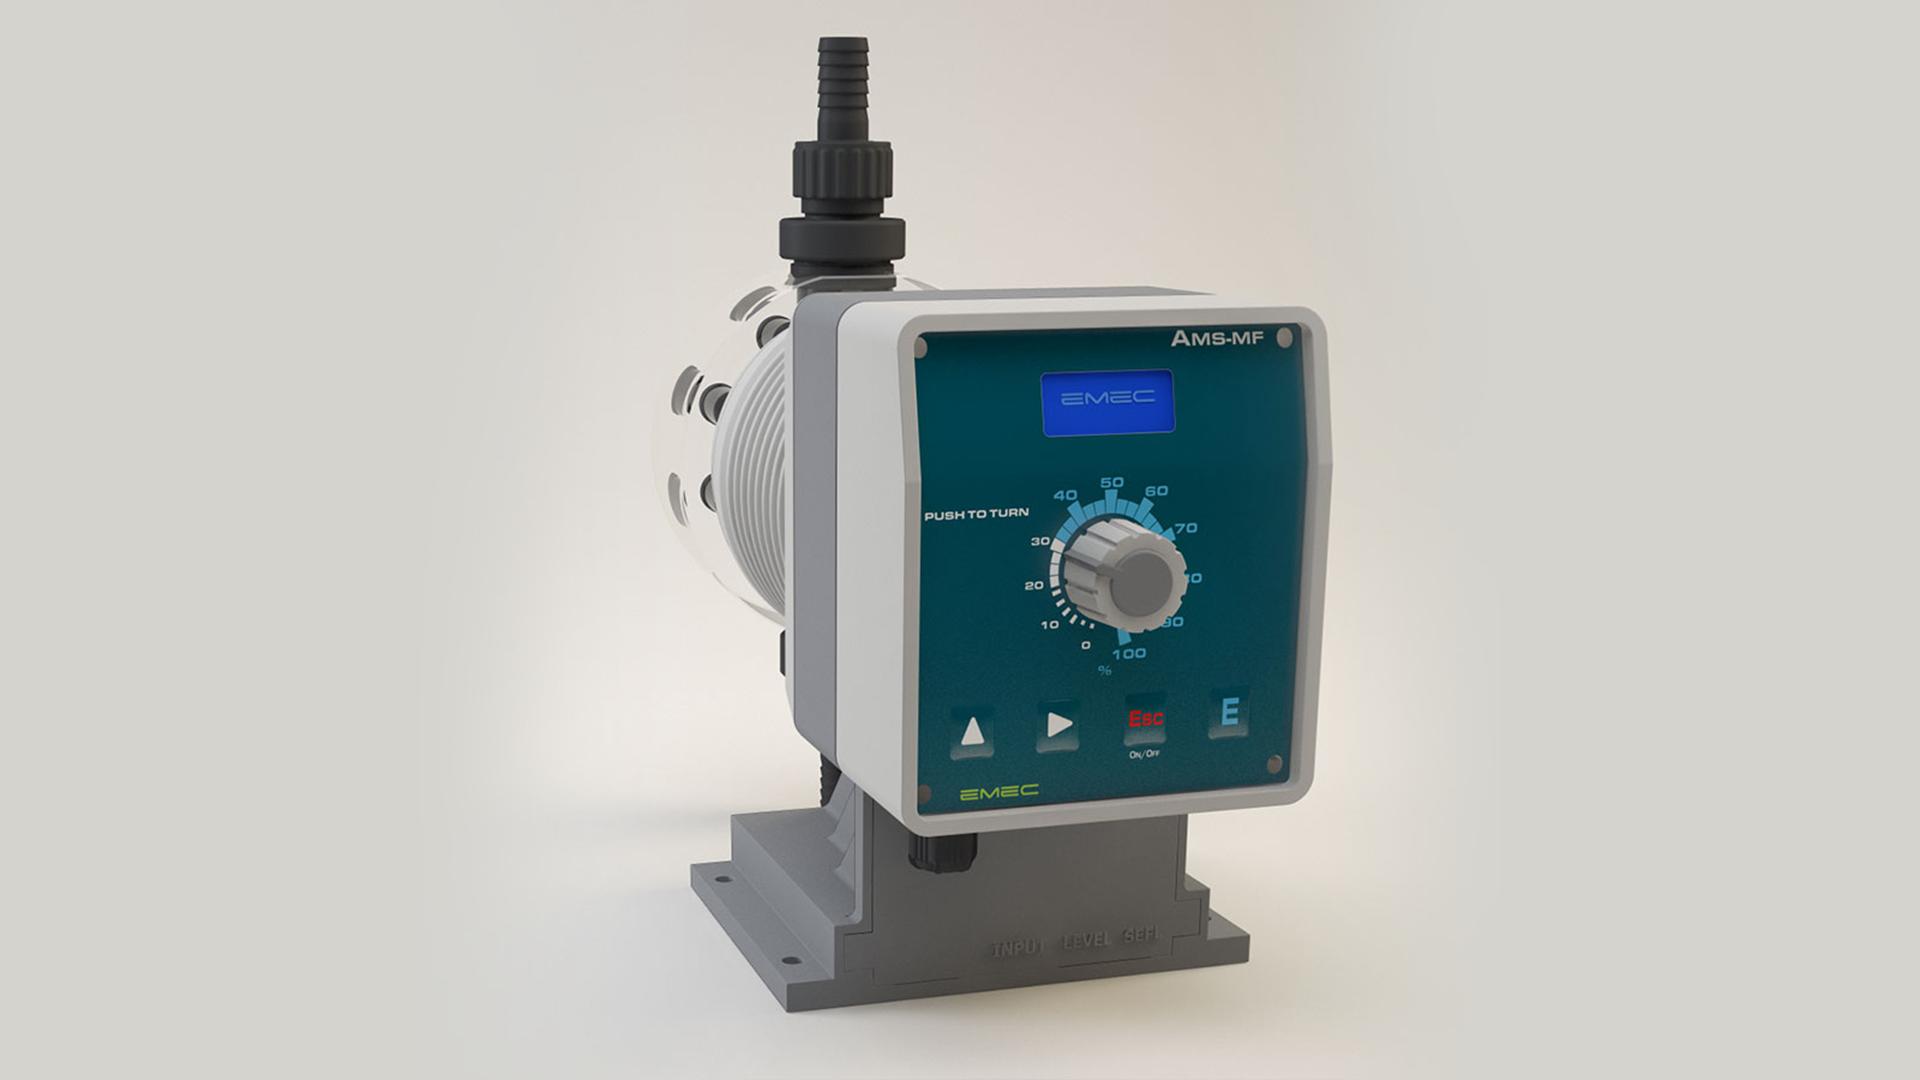 EMEC AMS Serisi Elektromanyetik Dozaj Pompaları